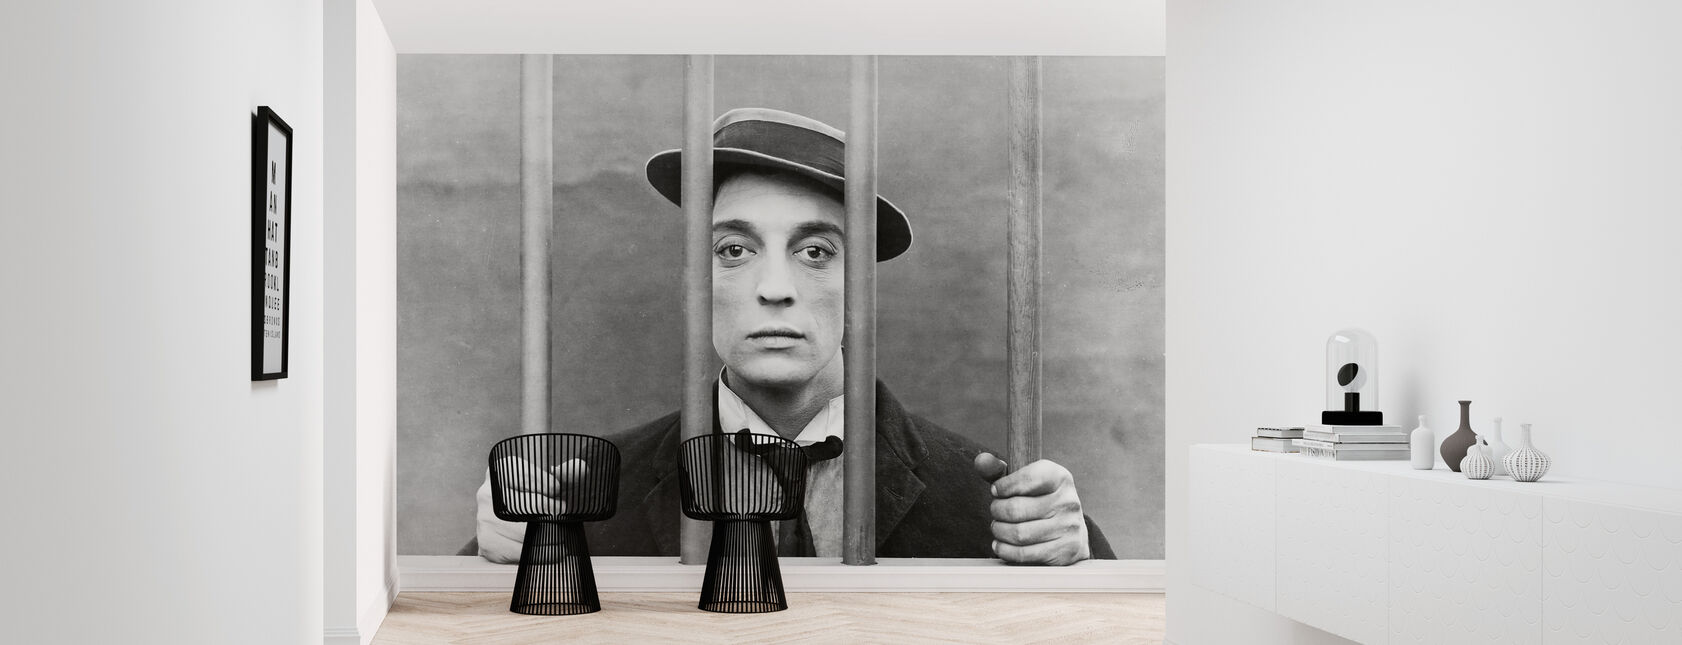 Goat - Buster Keaton - Wallpaper - Hallway